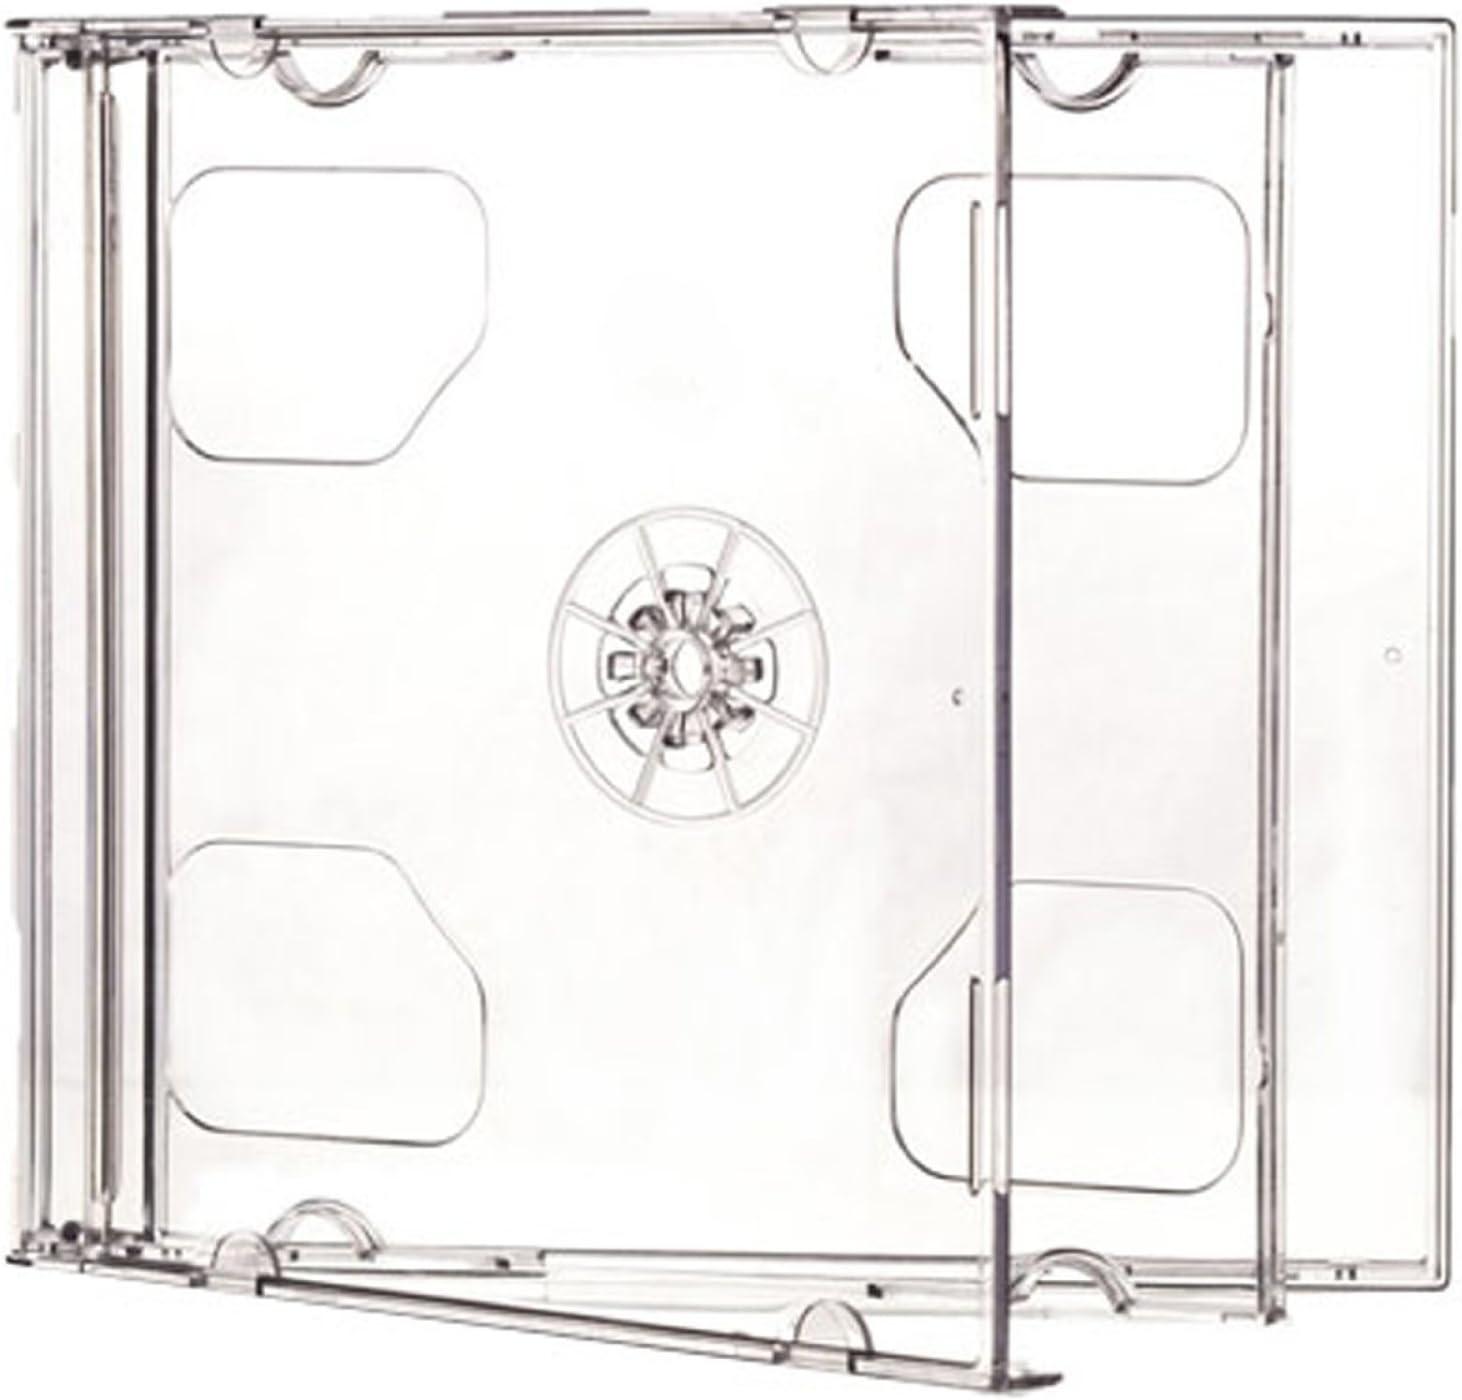 Doble CD Jewel Cases 10.4 mm para 2 Disco con Bandeja Clara (Pack ...